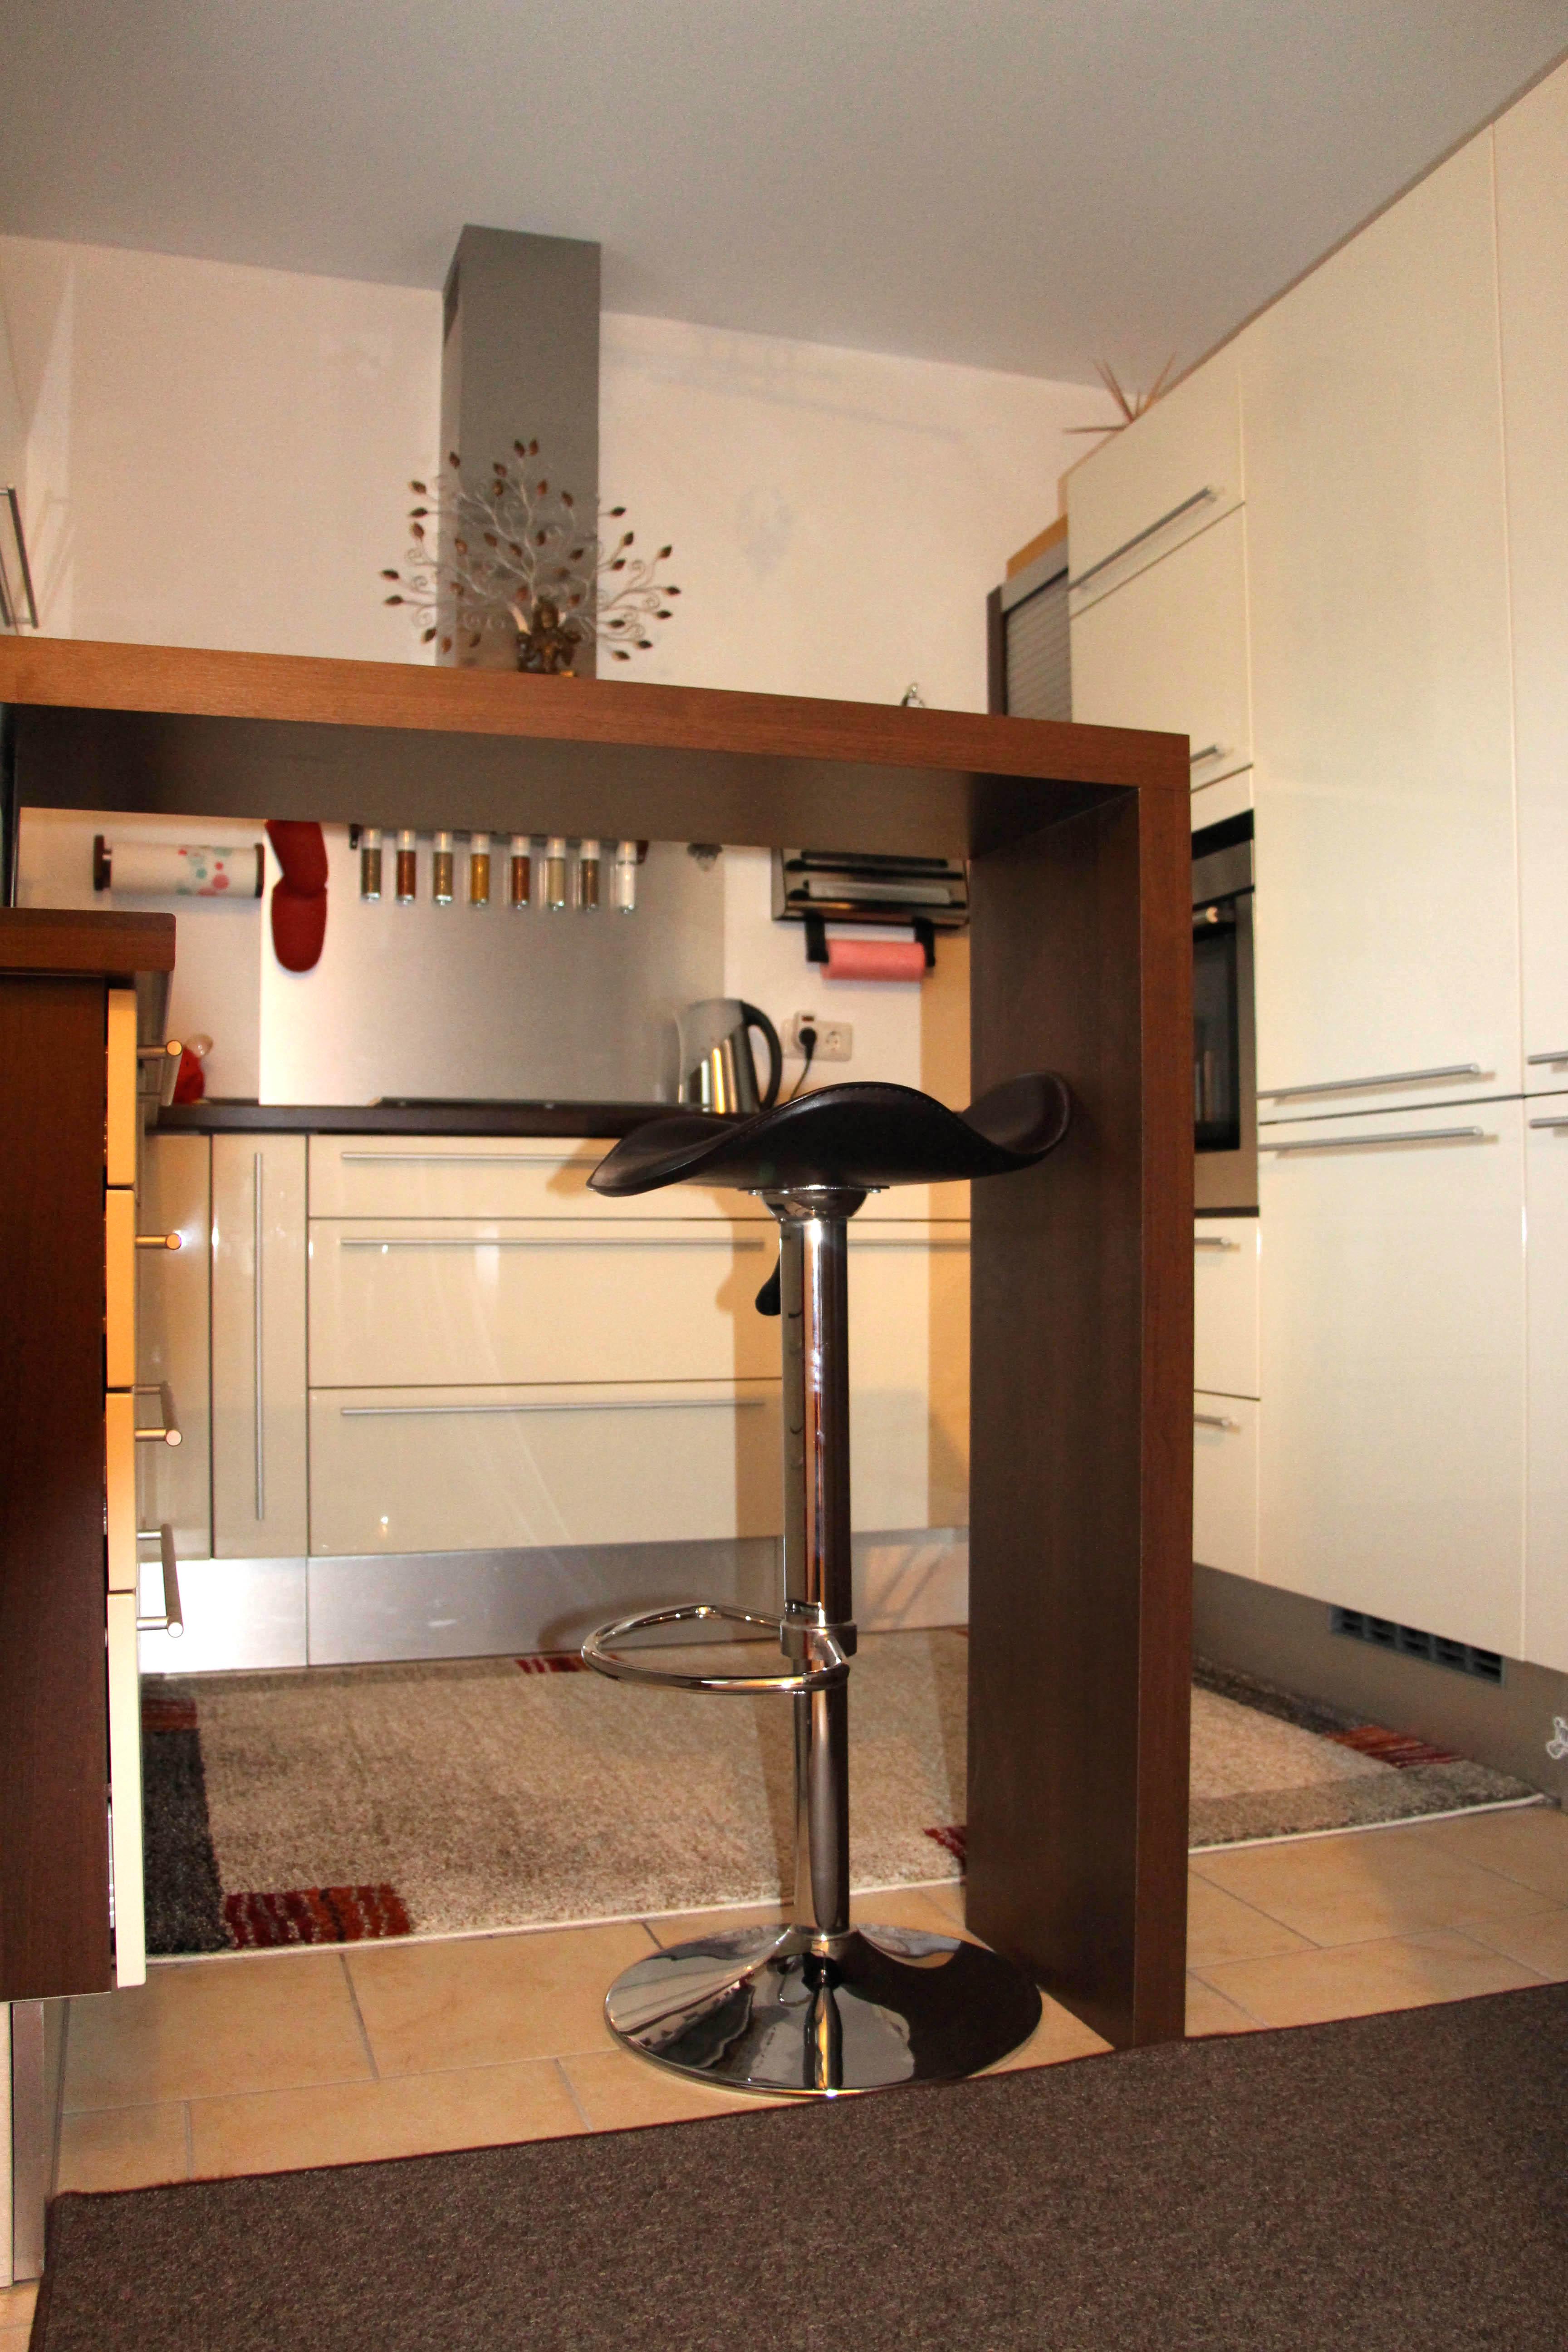 Ess-Bar - Maßanfertigung Küche